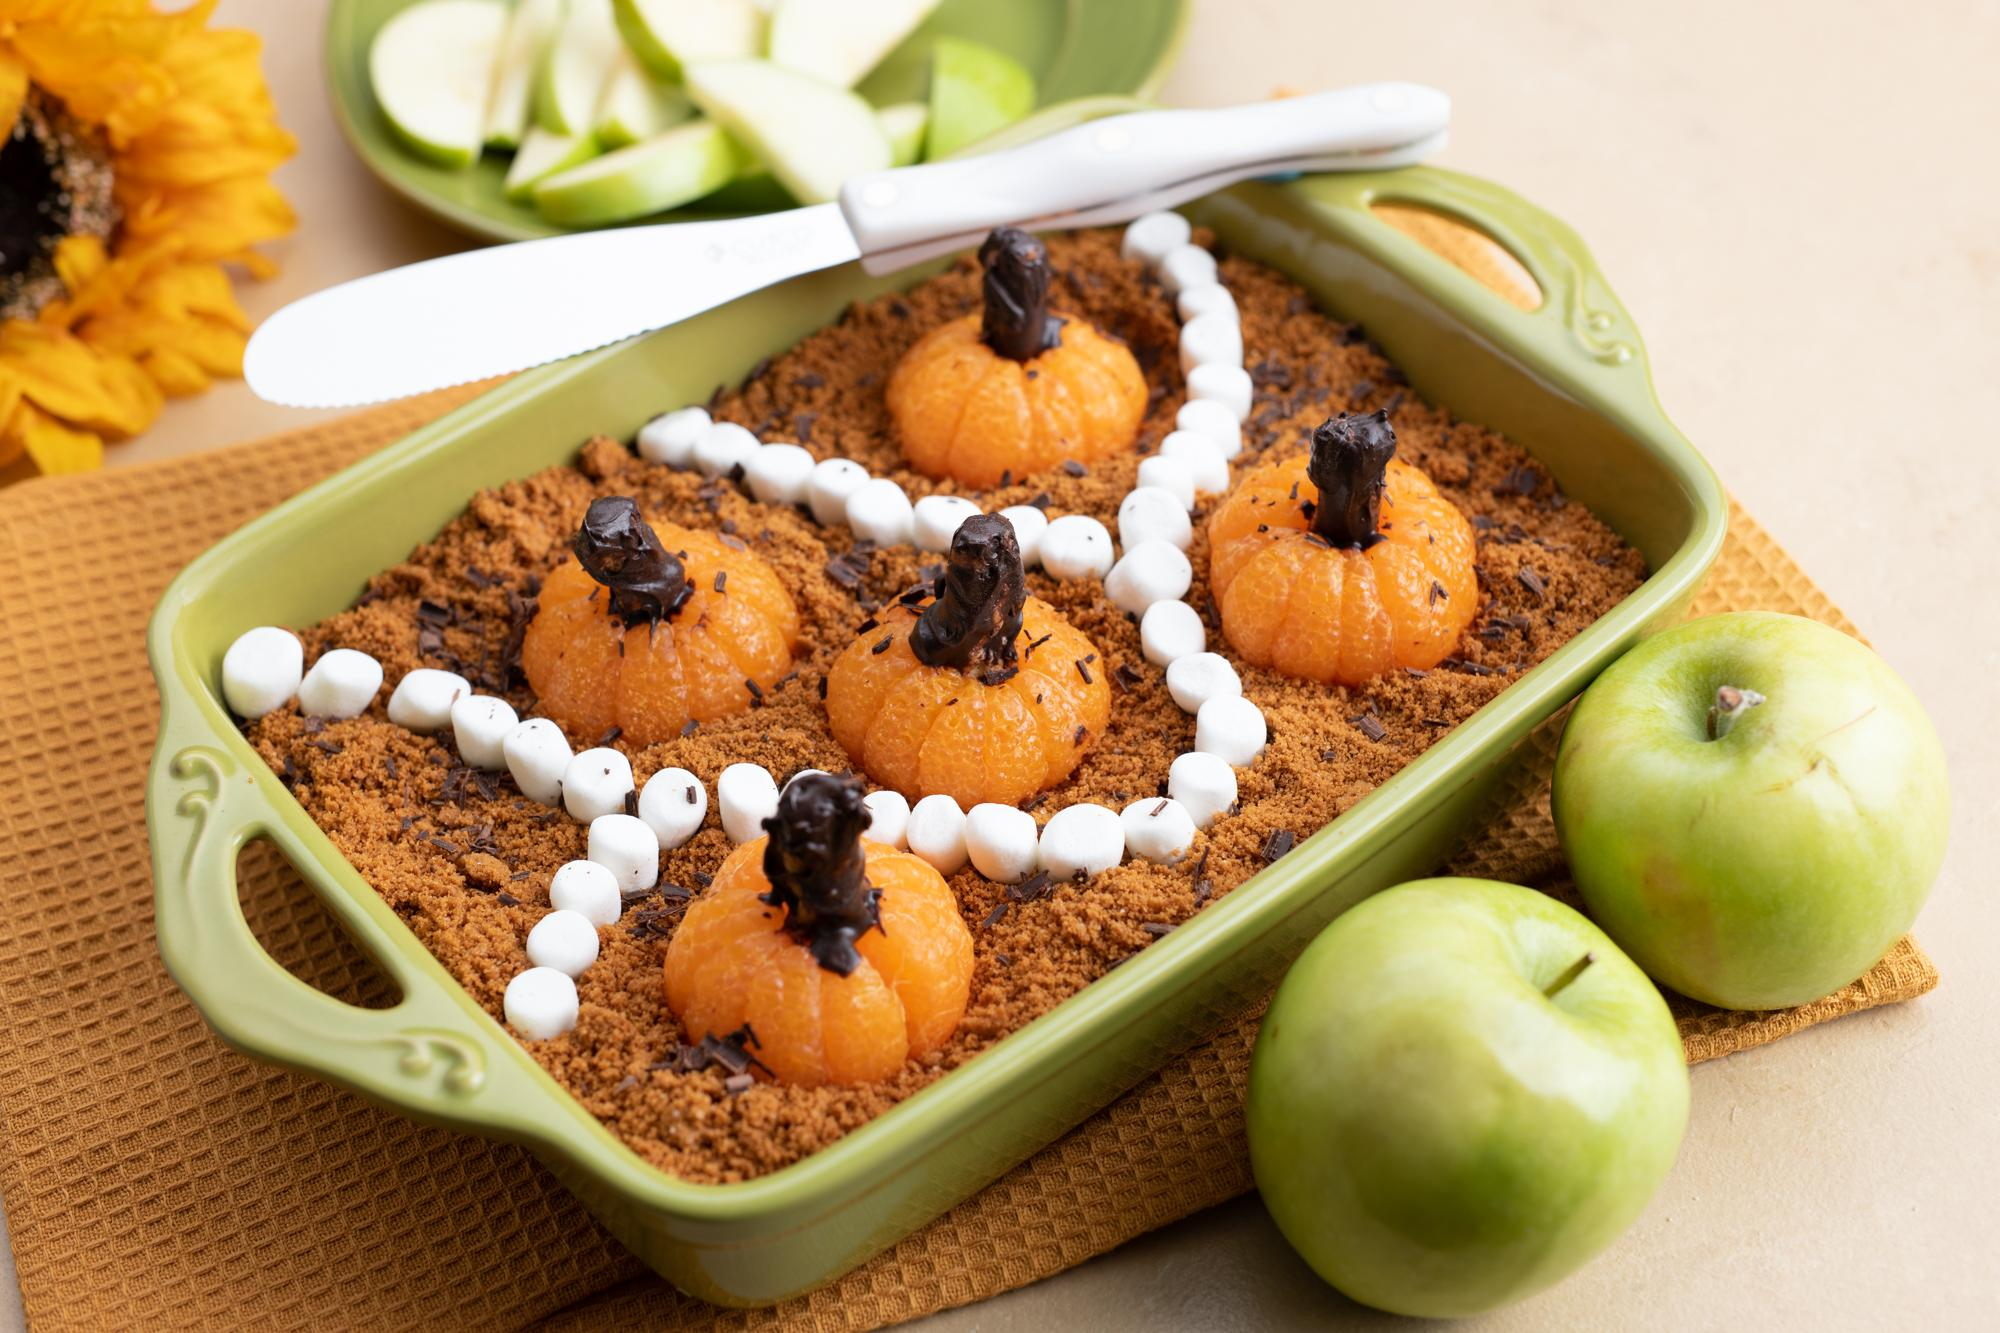 Layered Fruit Dip for Halloween